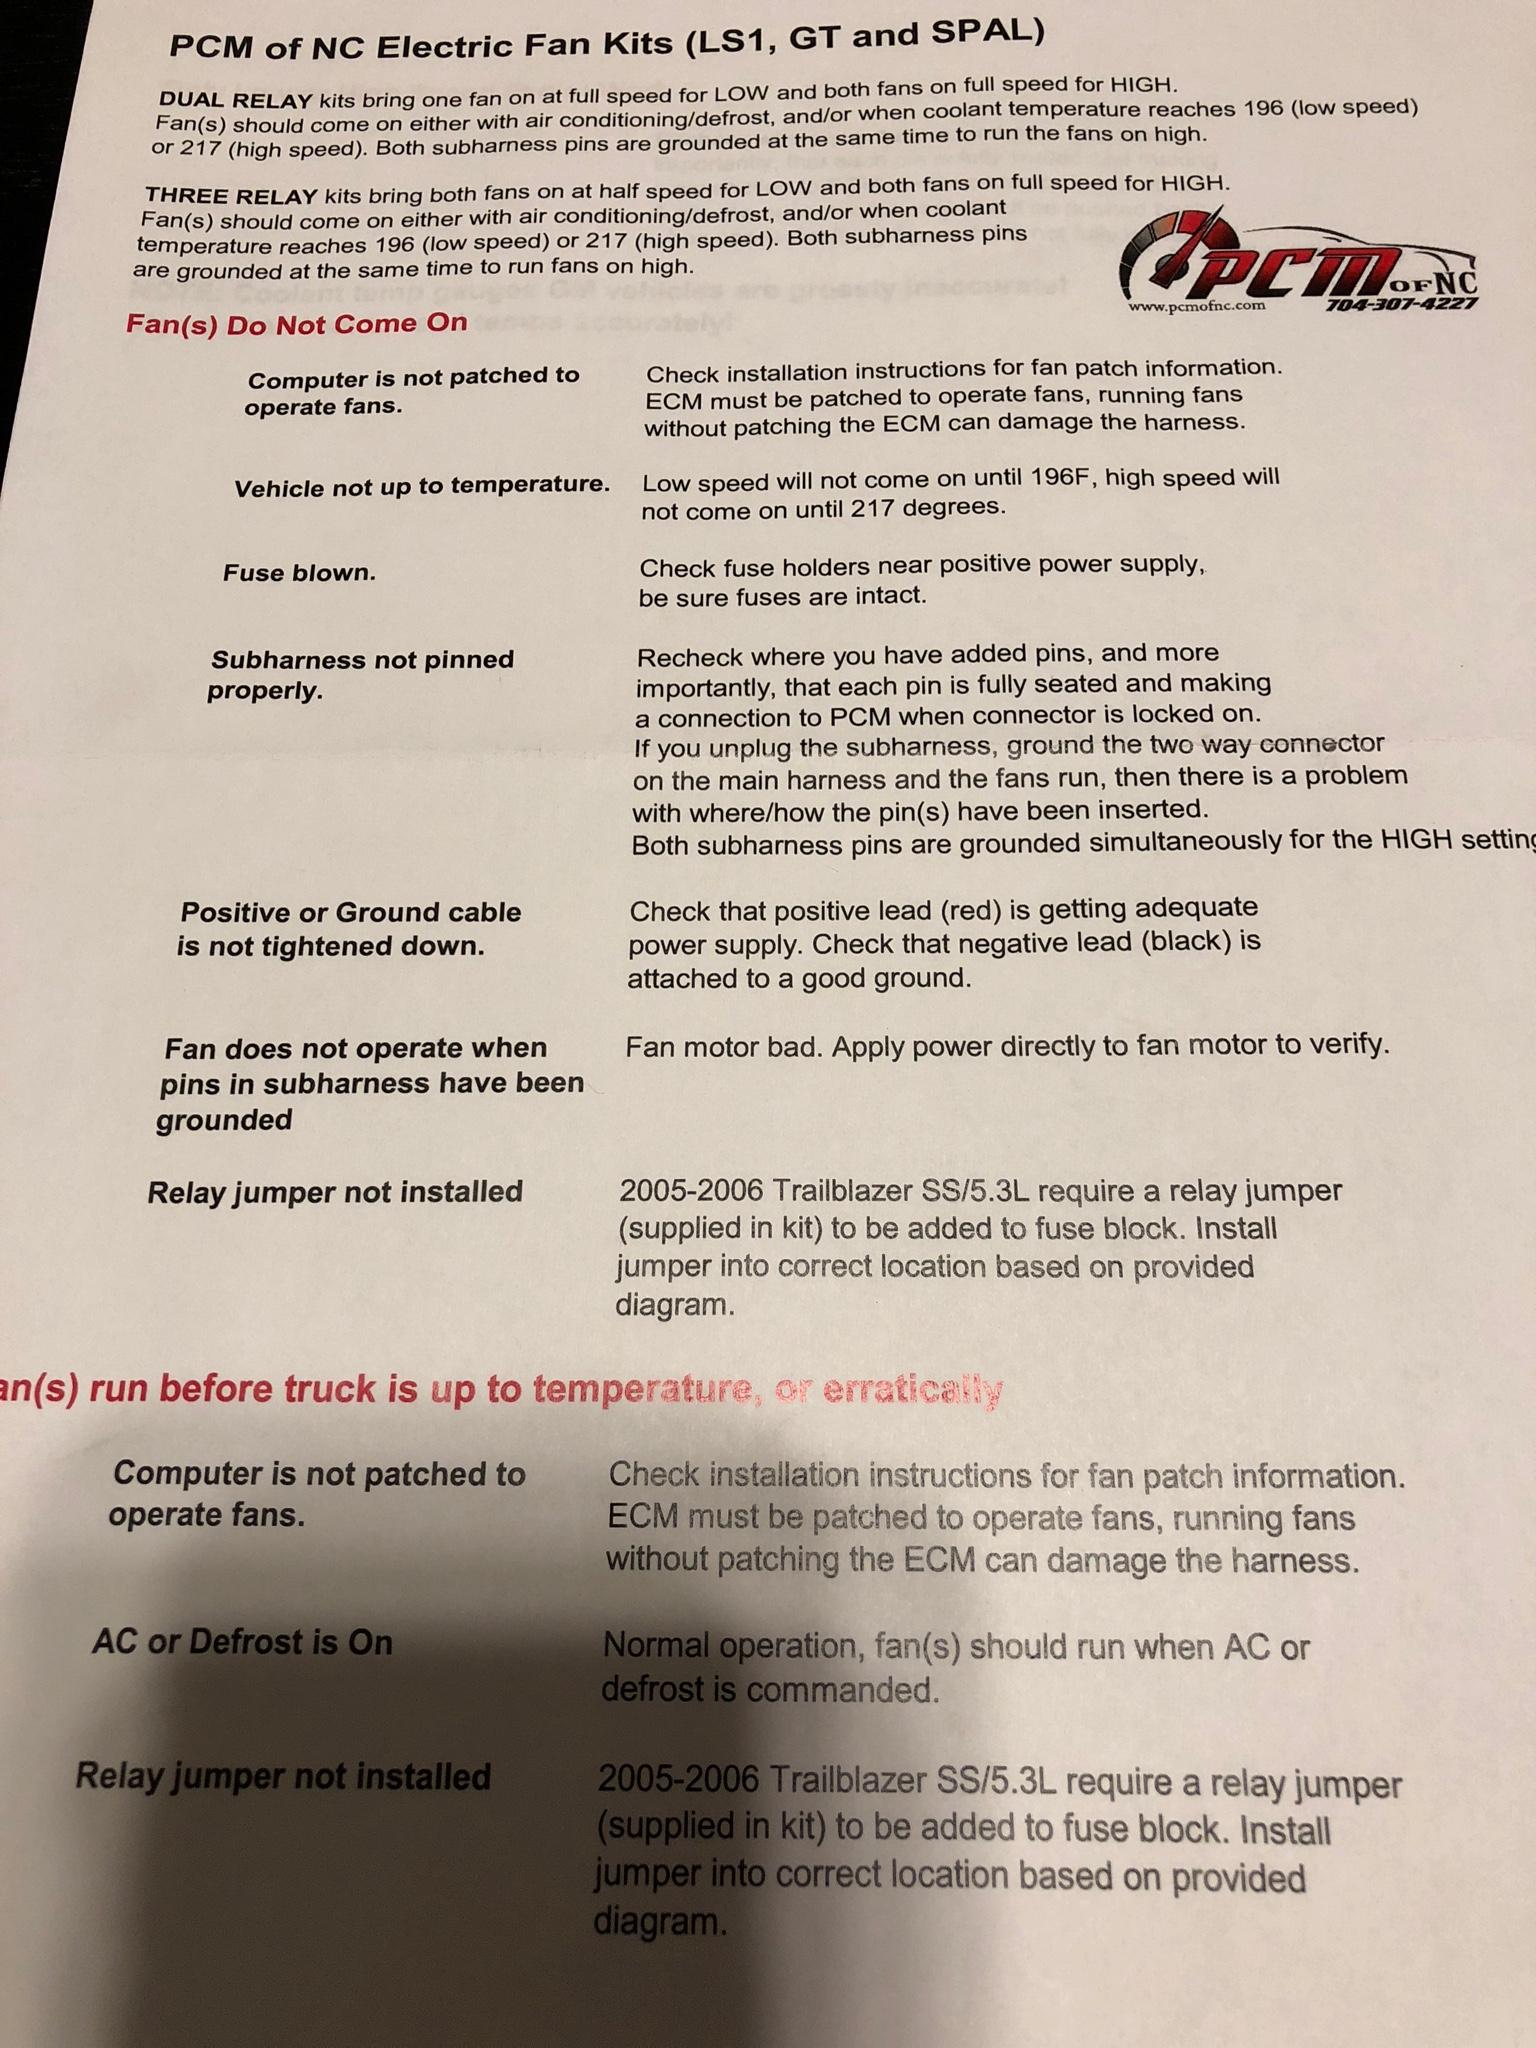 Spal fan issues - Chevy Trailblazer SS Forum